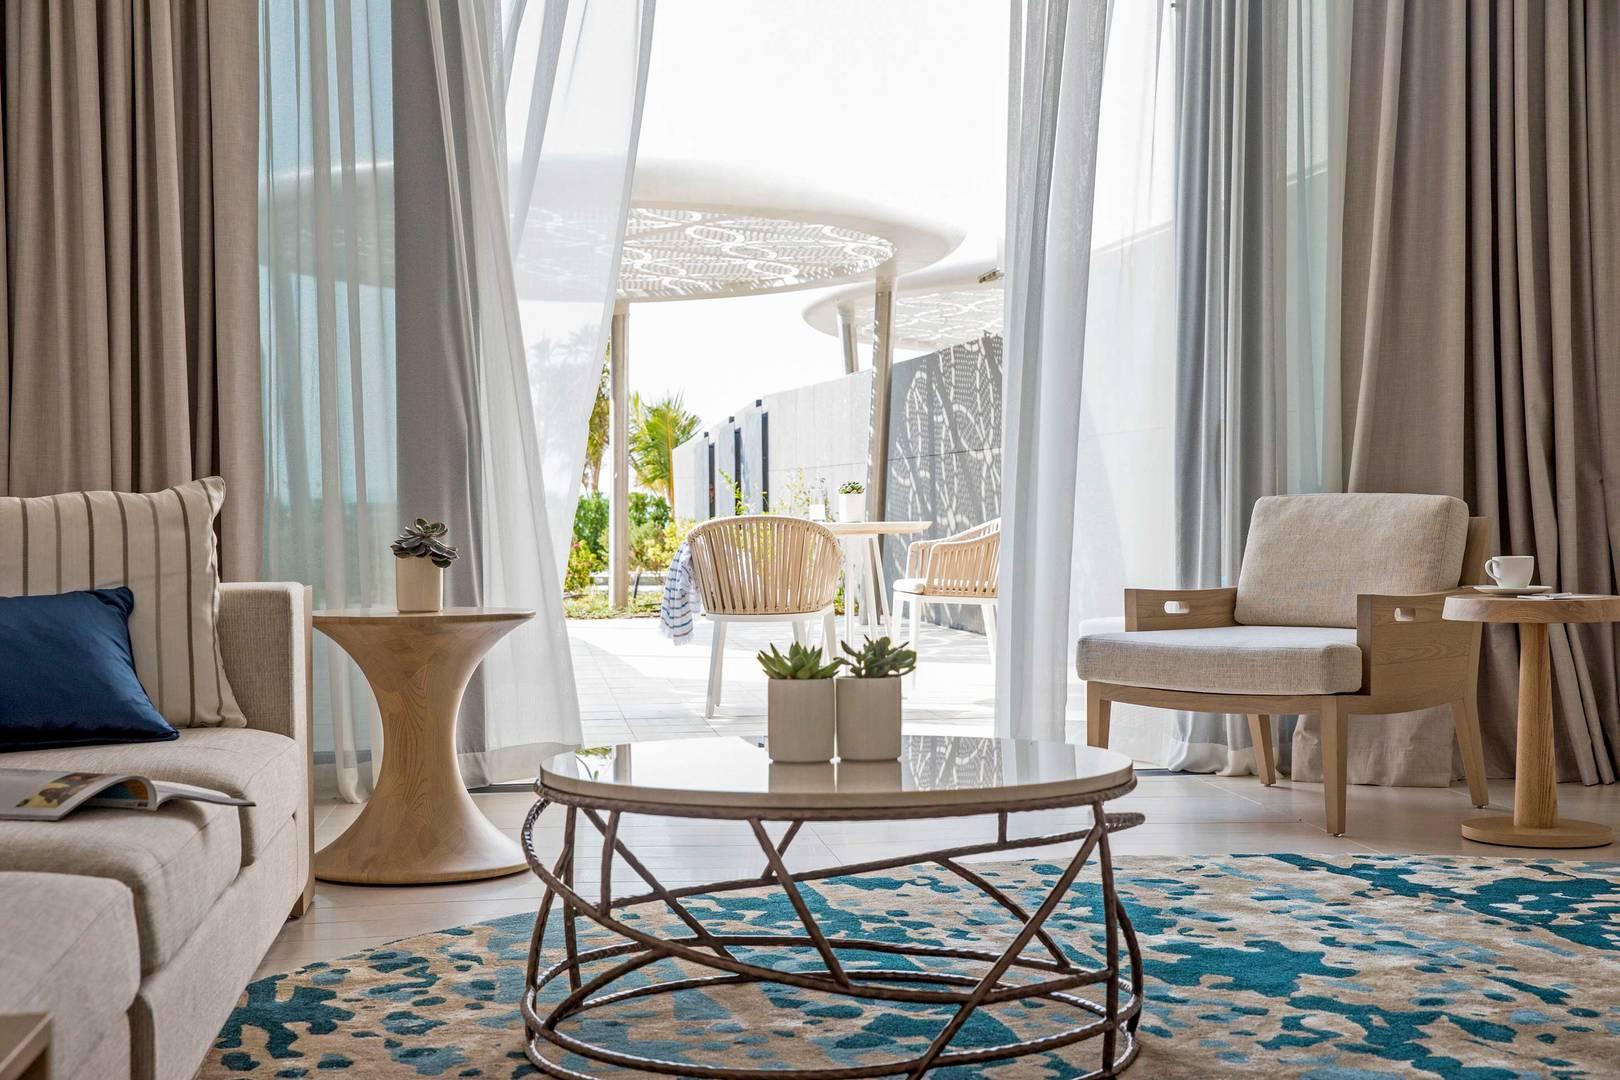 View at the balcony of the Ocean Terrace Suite at Jumeirah Saadiyat Island Resort